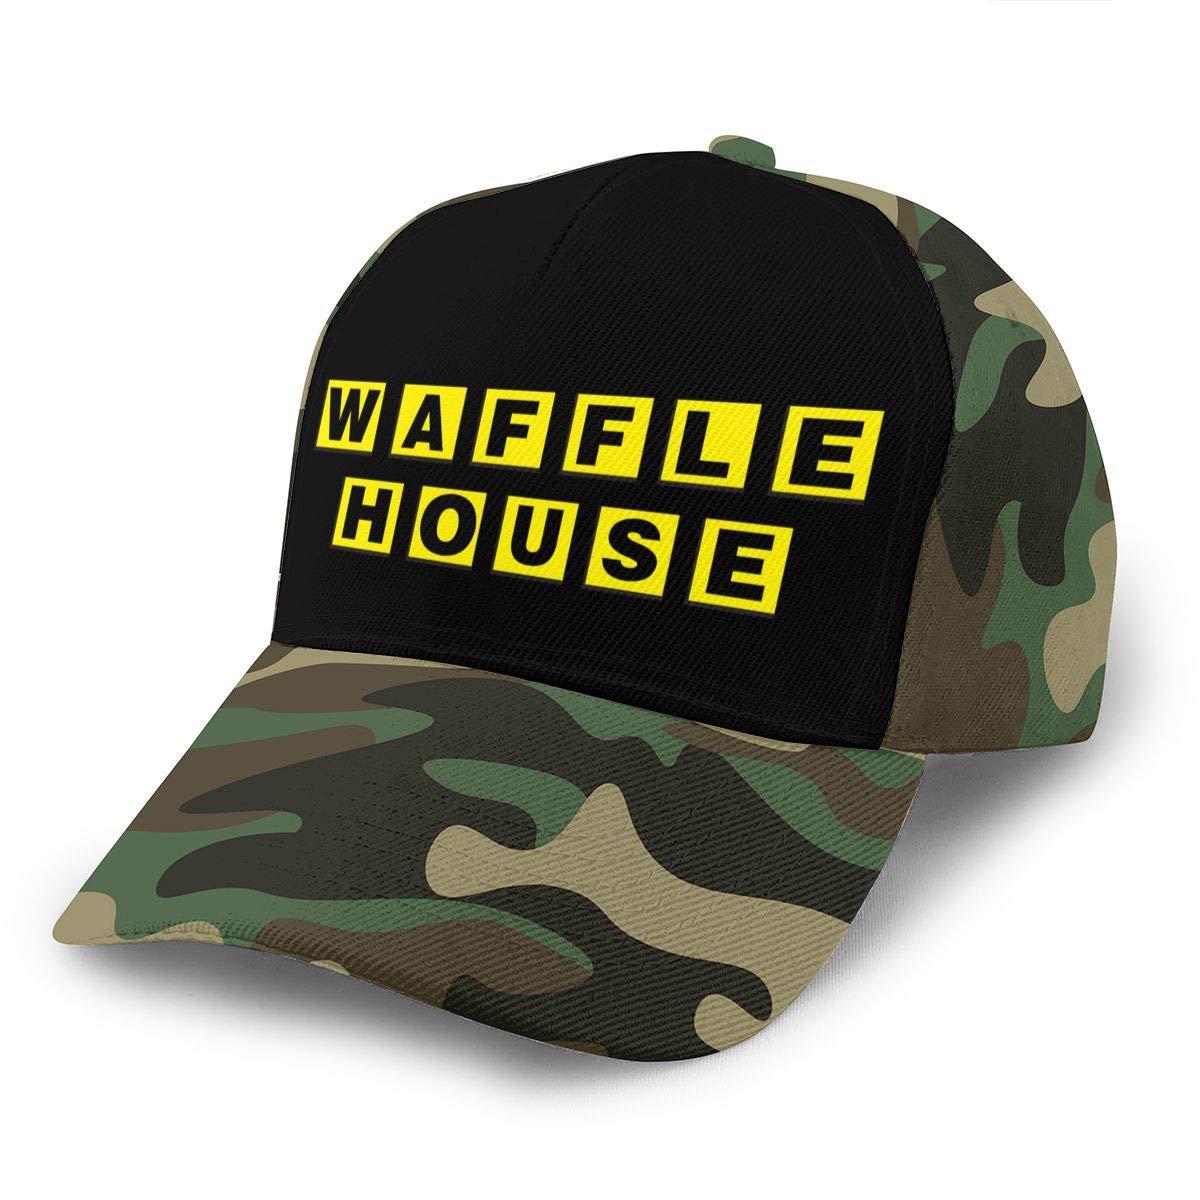 Adjustable Women Men Waffle-House-Logo Print Baseball Cap Flat Brim Cap Hats Hip Hop Snapback Sun Hat Boys Girls Moss Green by Apolonia